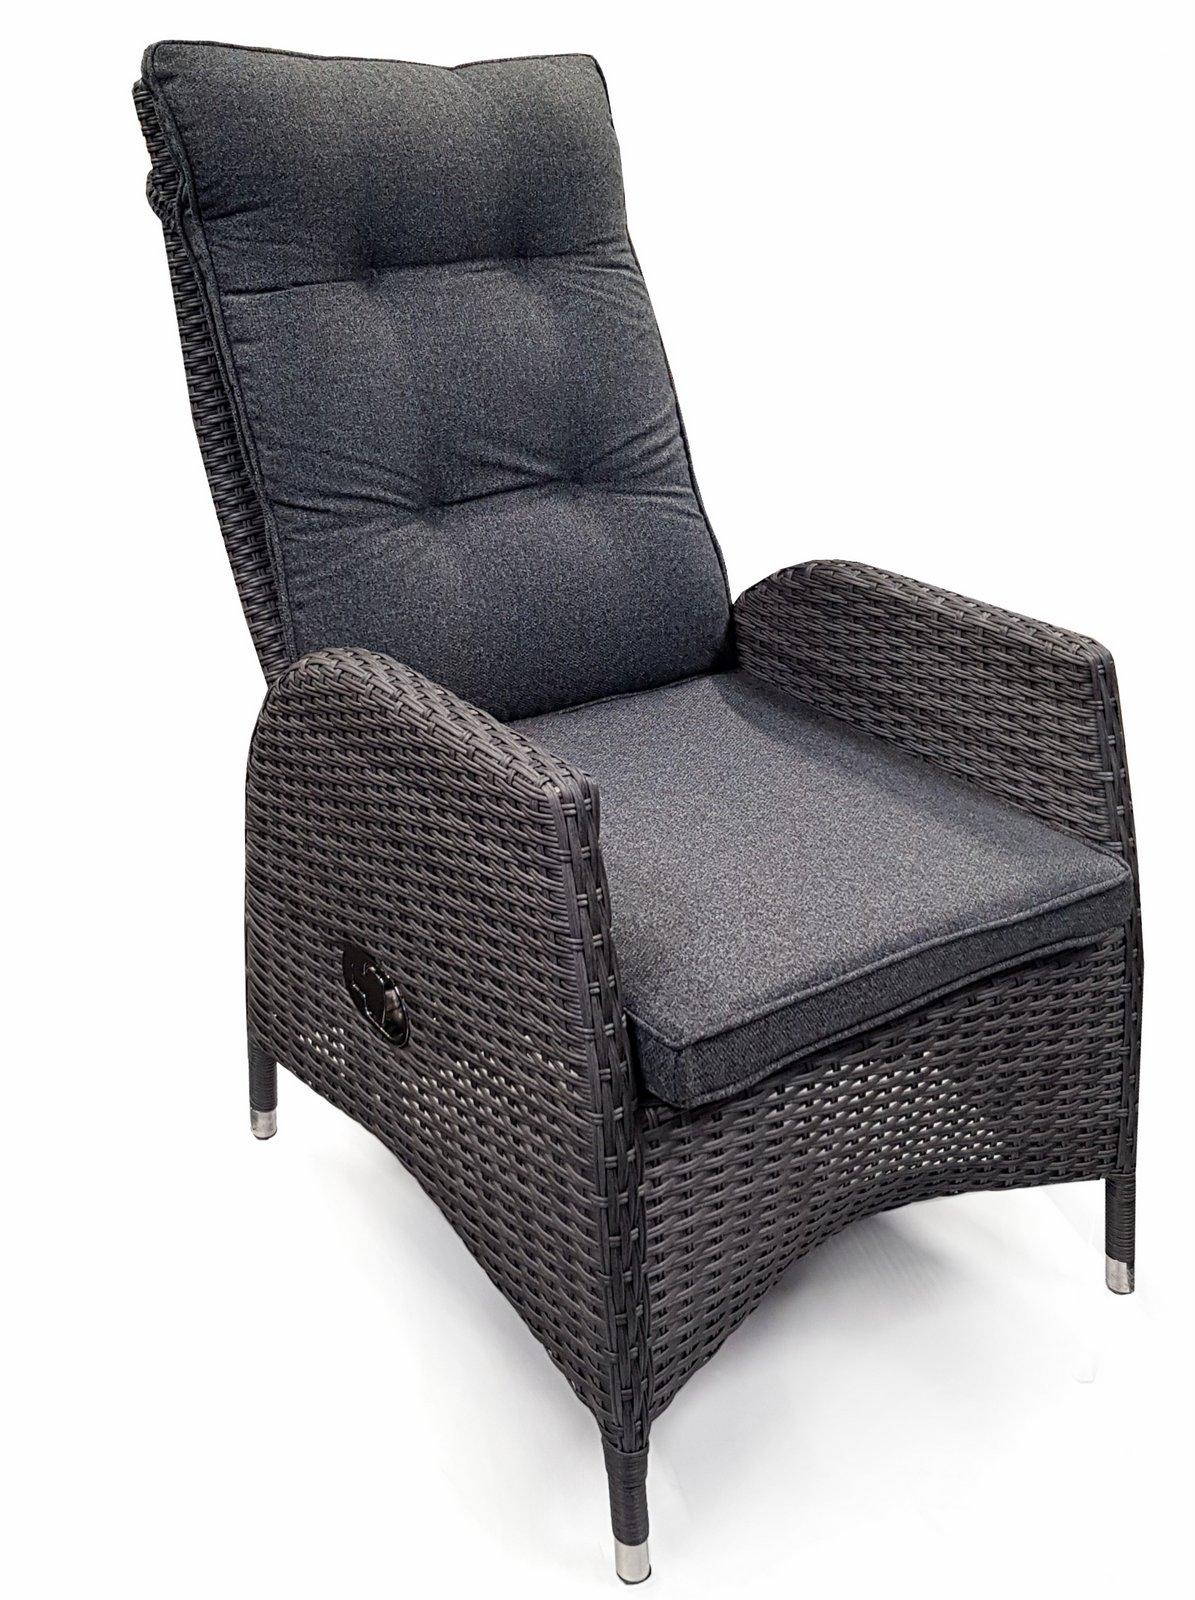 osoltus poly wicker rattansessel korbsessel vesrstellbar. Black Bedroom Furniture Sets. Home Design Ideas